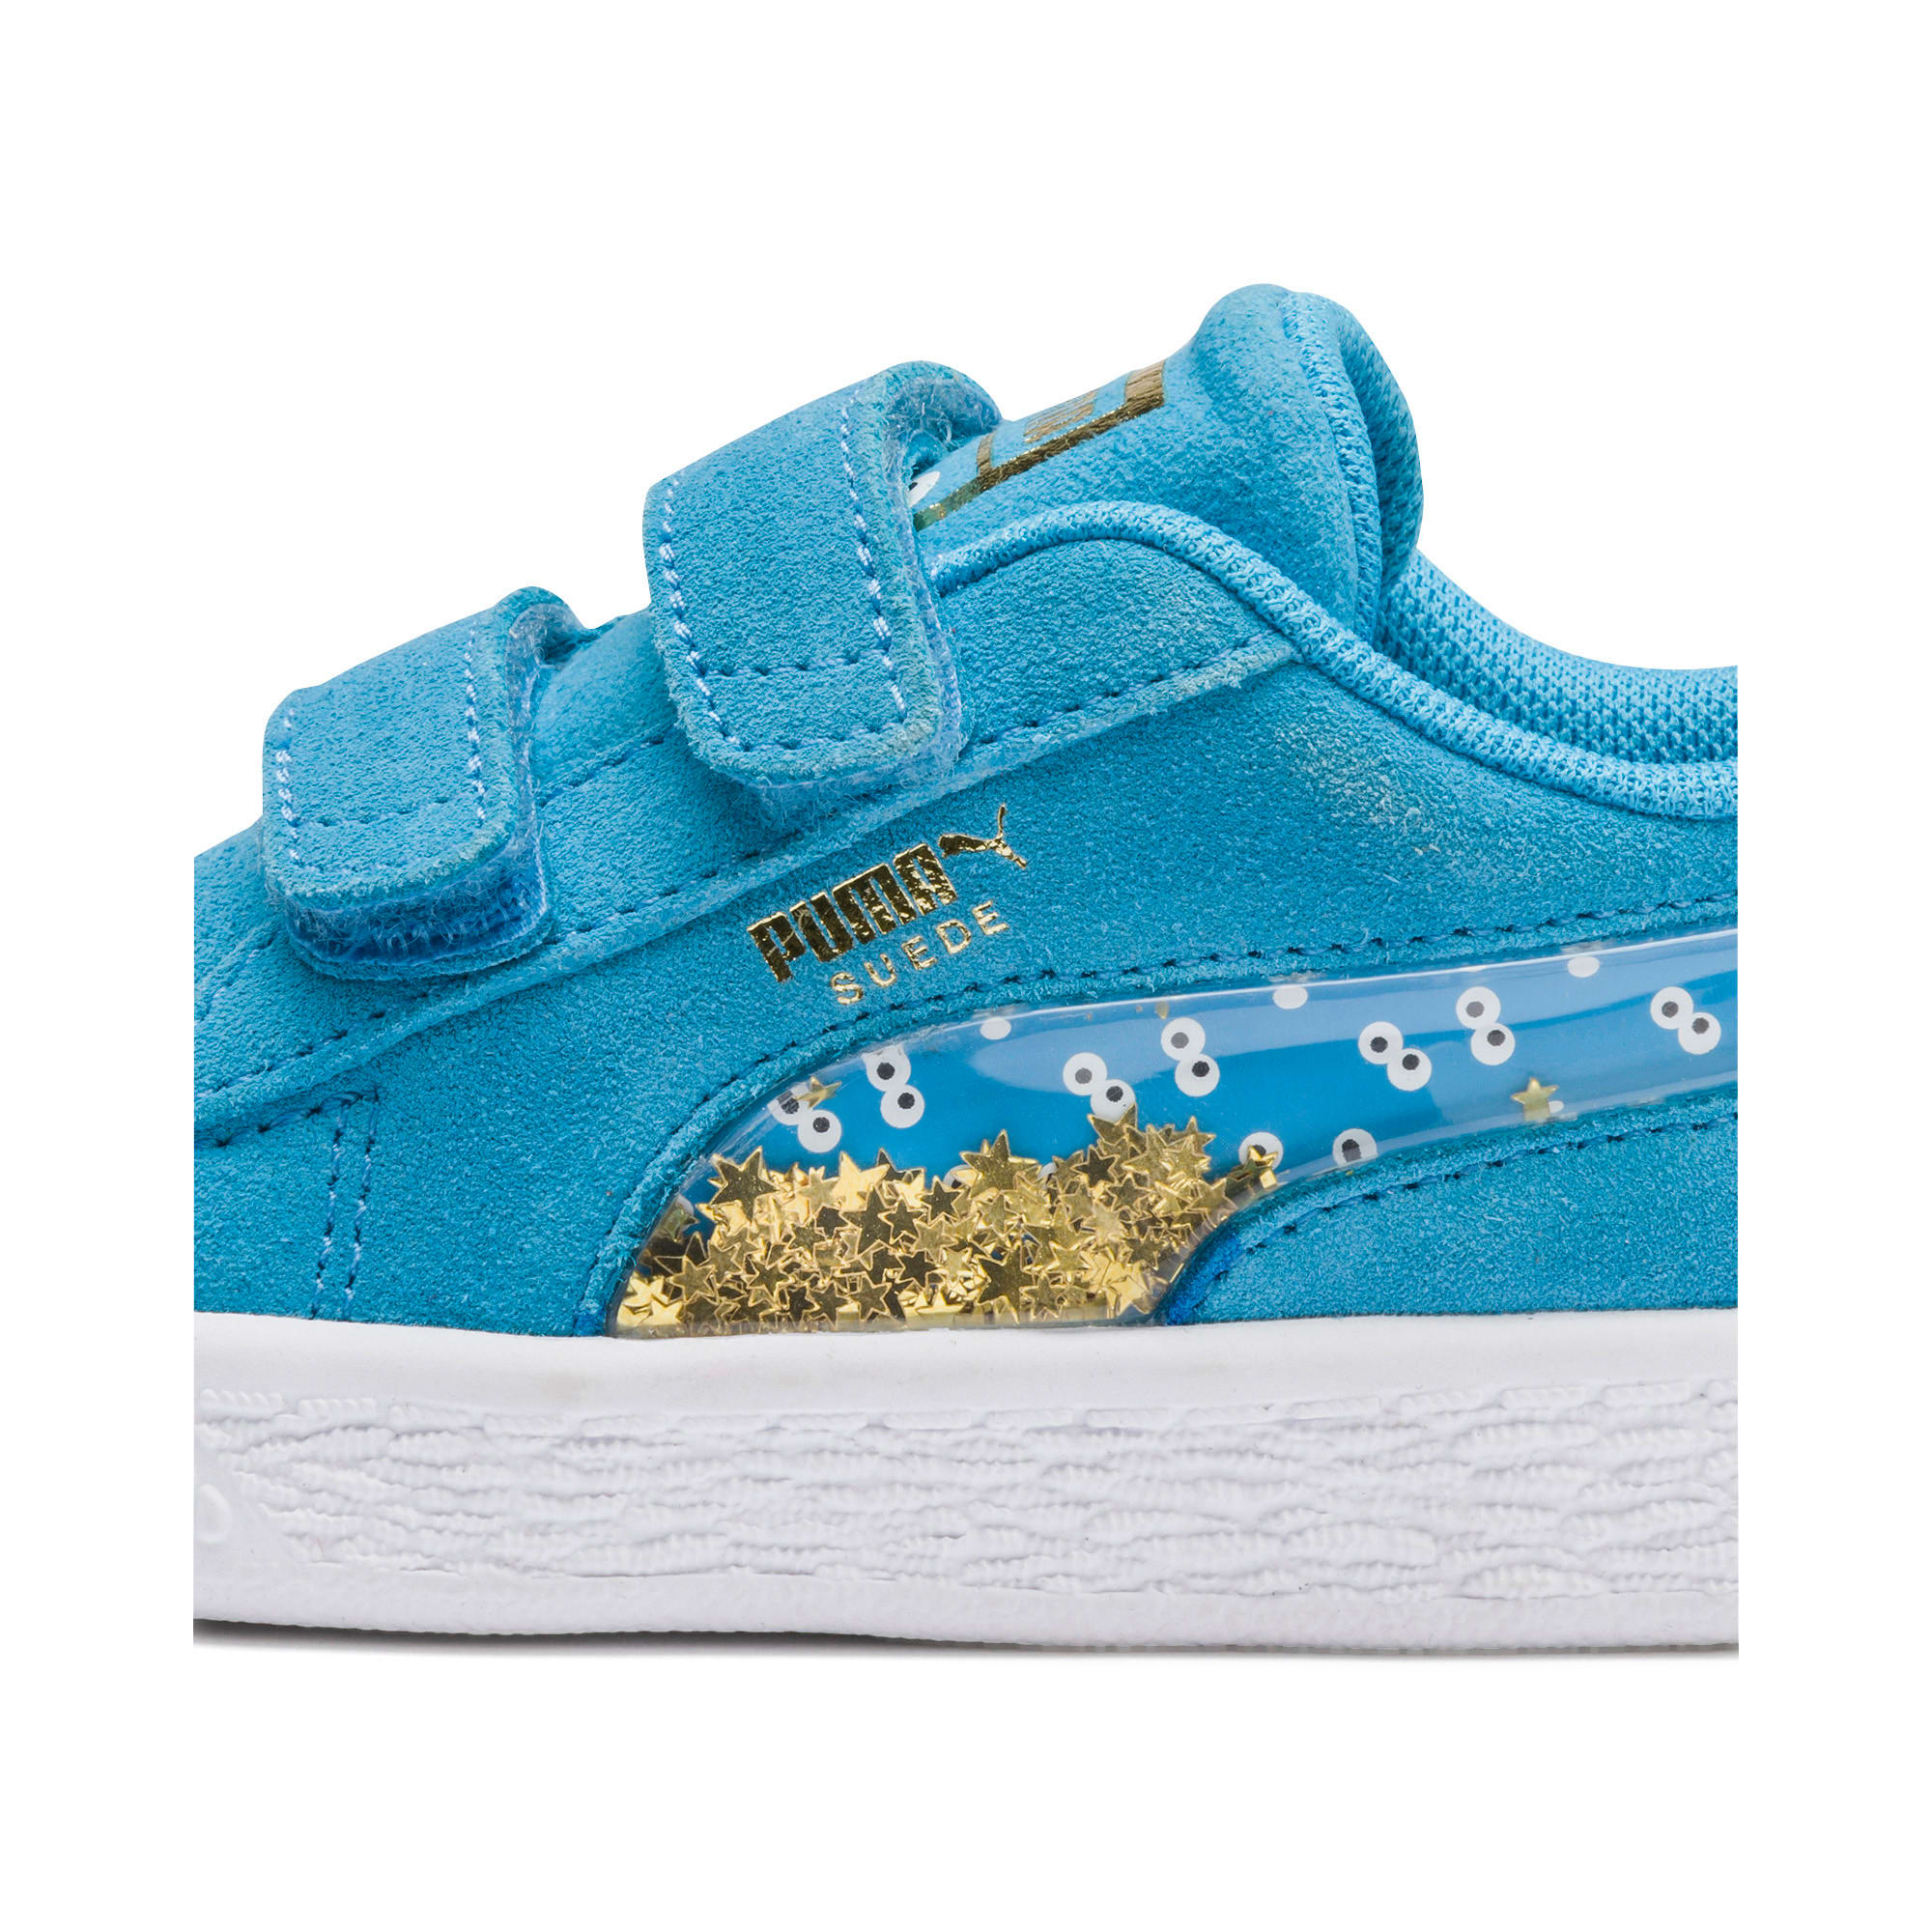 Thumbnail 8 of PUMA x SESAME STREET 50 Suede Statement Toddler Shoes, Bleu Azur-Puma White, medium